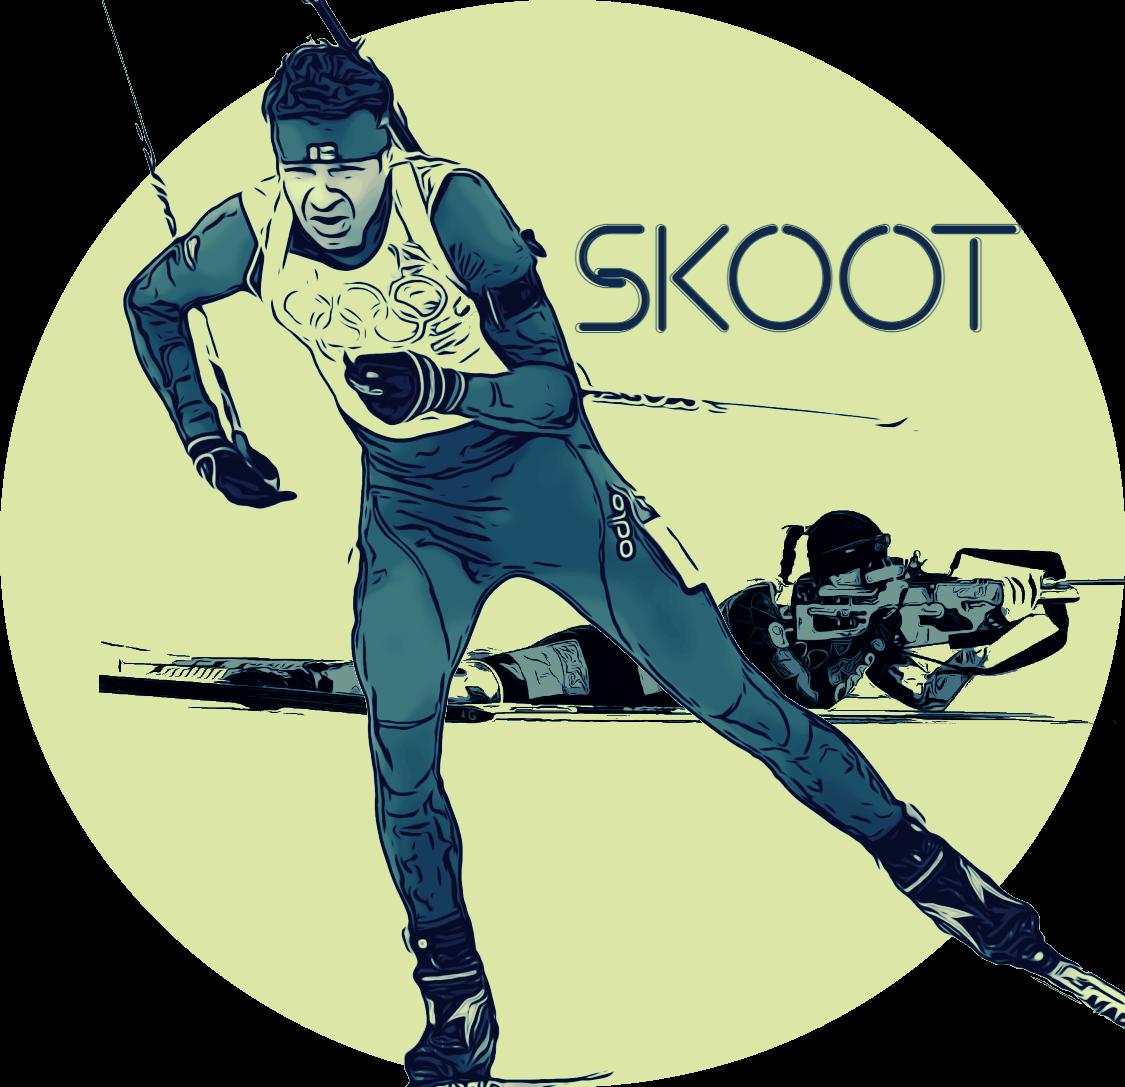 SkootBiathlonBoardgameLogo